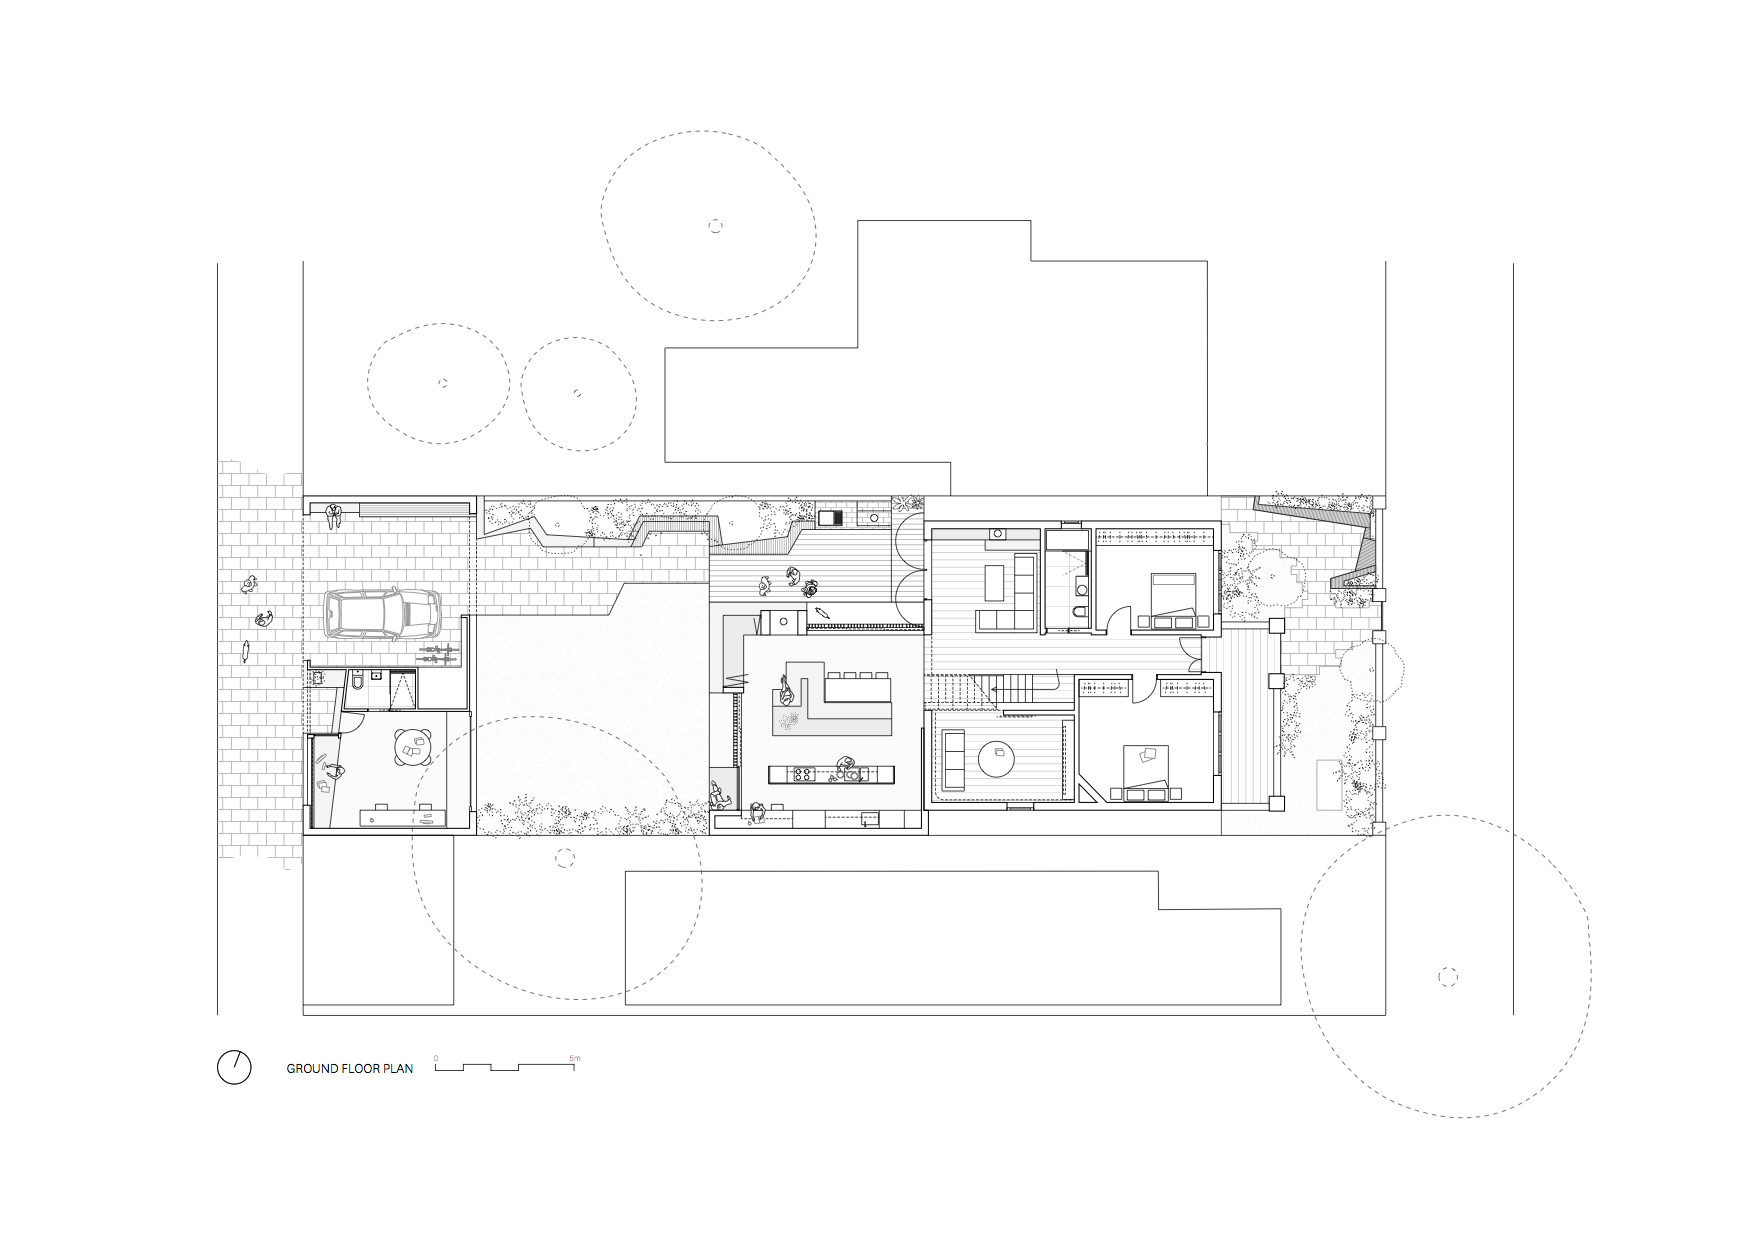 superb local house plans #3: Ground Floor Plan